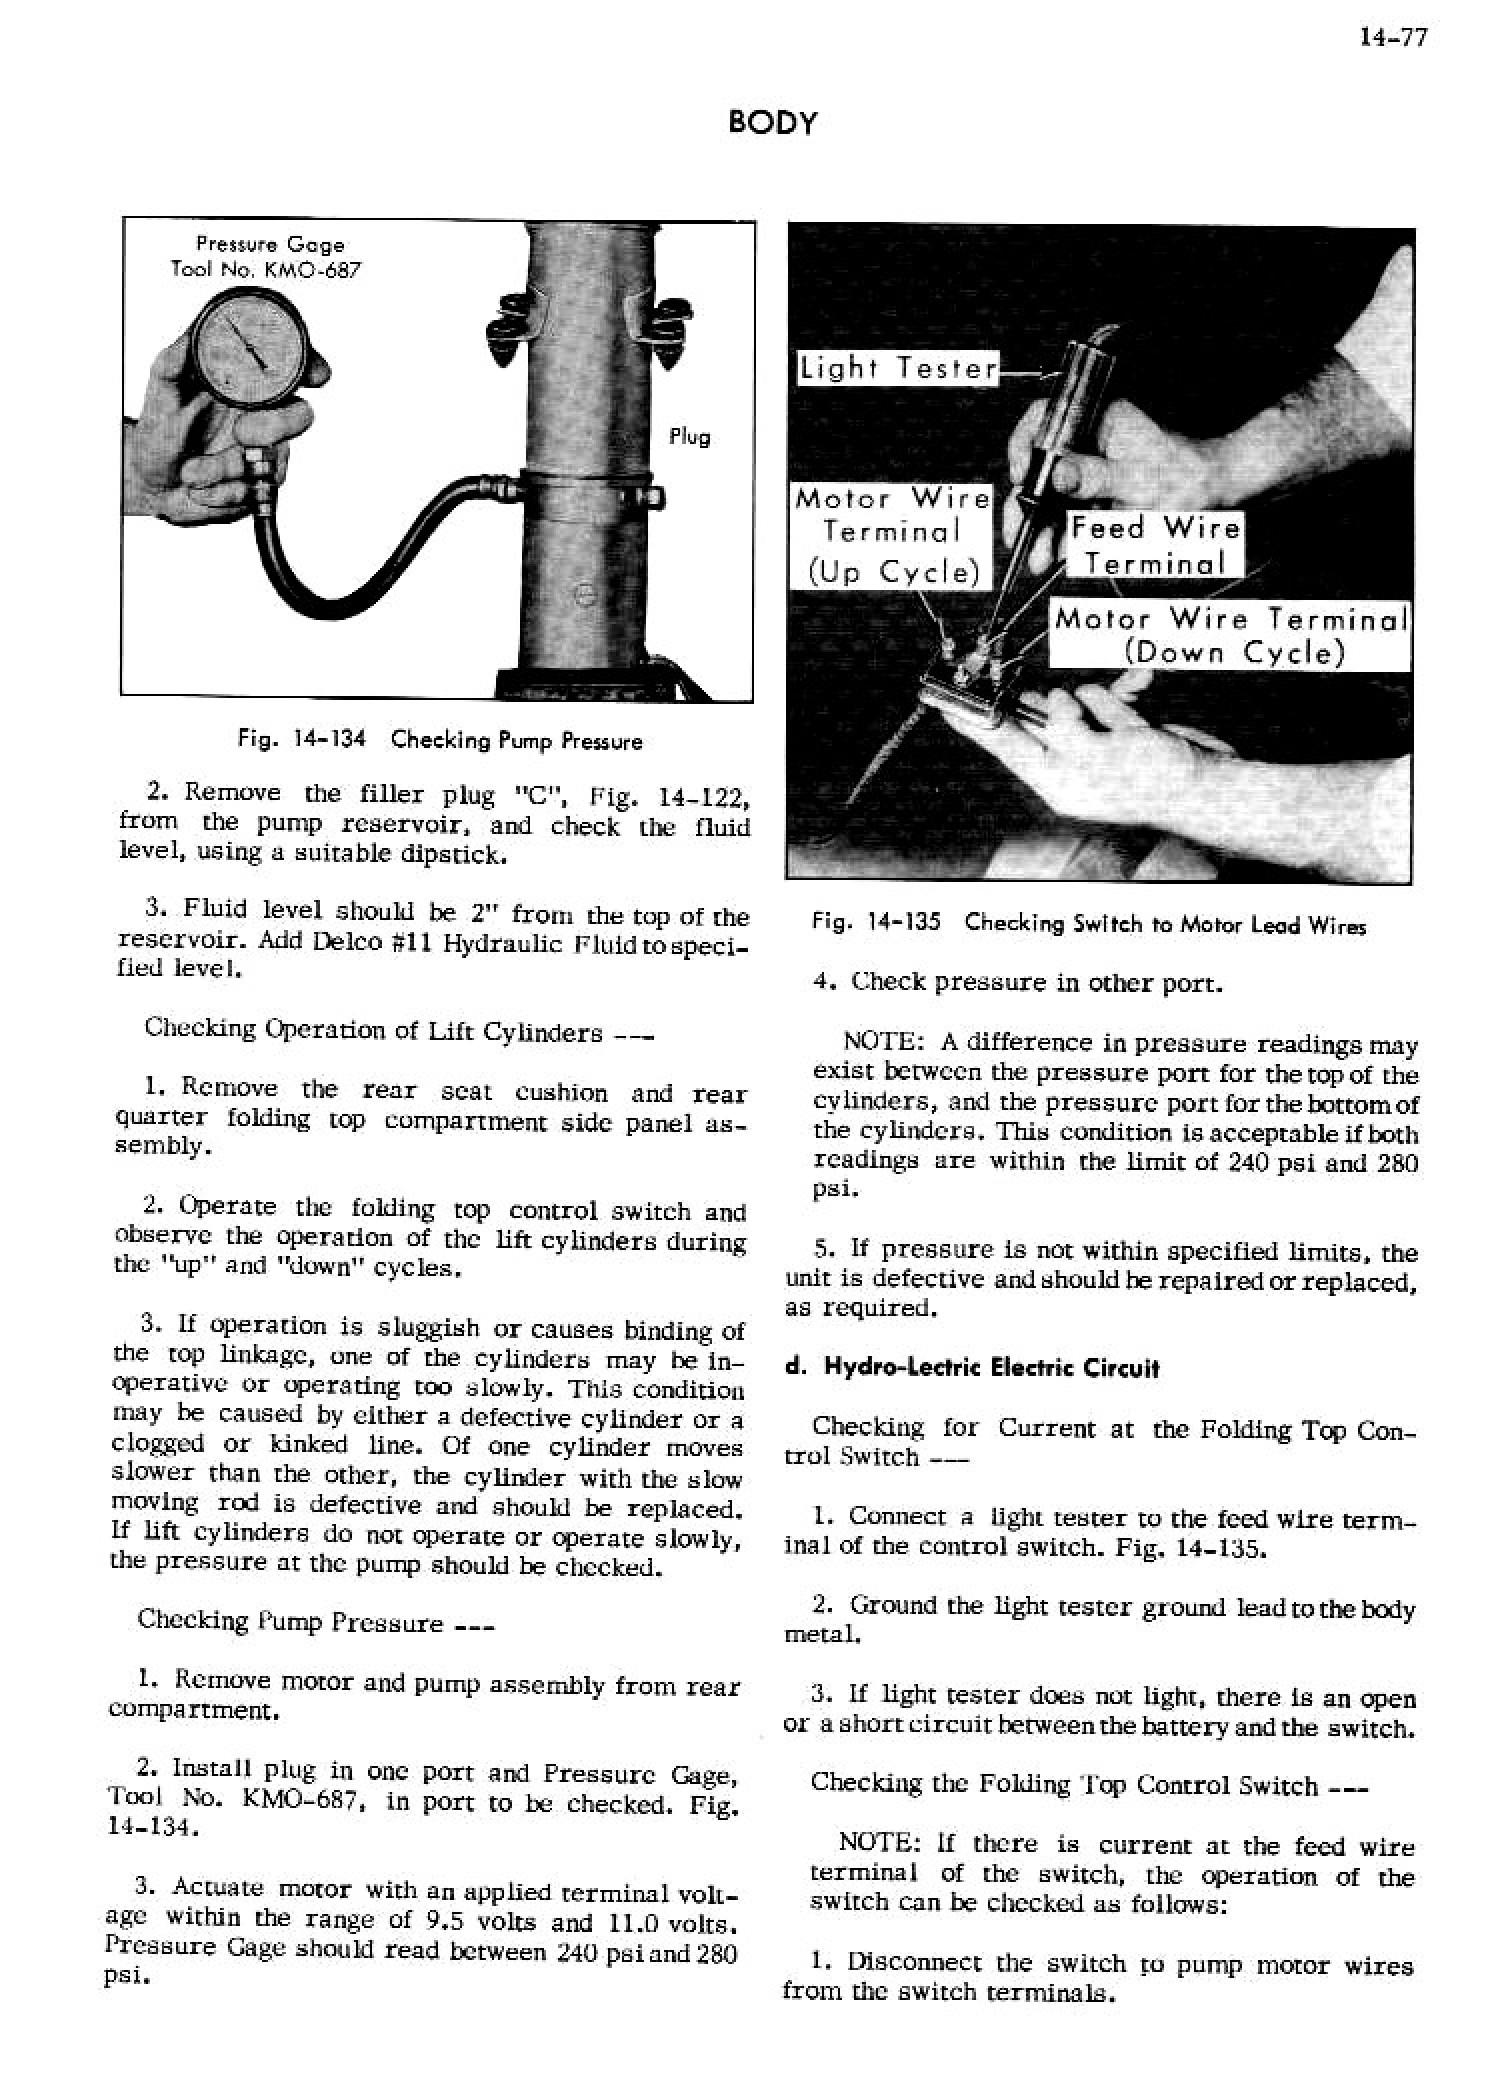 1956 Cadillac Shop Manual- Body Page 77 of 87